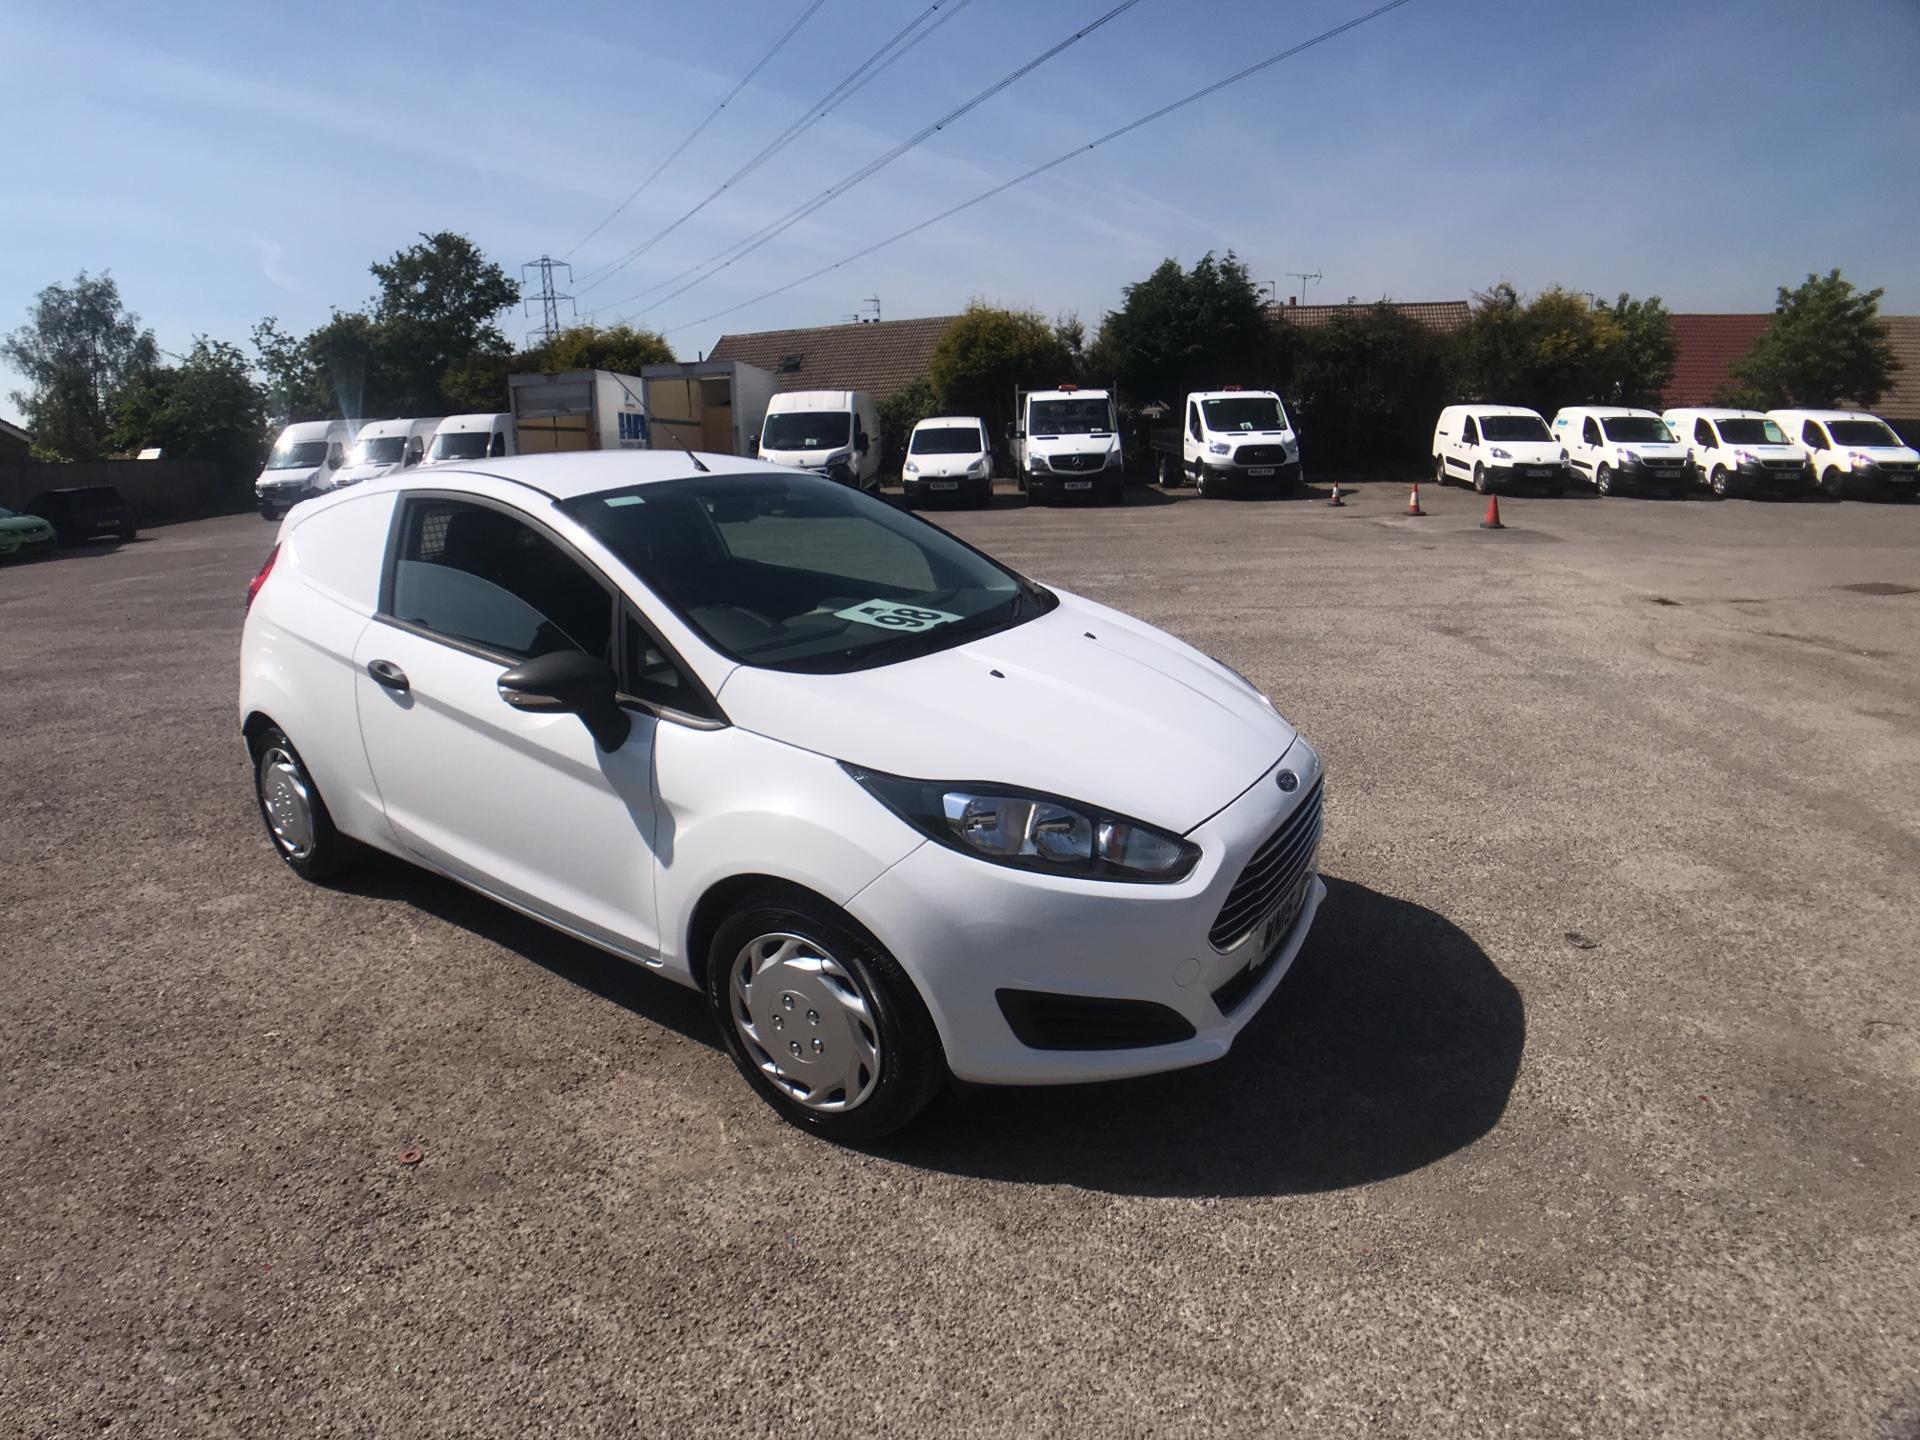 2015 Ford Fiesta 1.5 Tdci Van EURO 5 (WN15JZL)